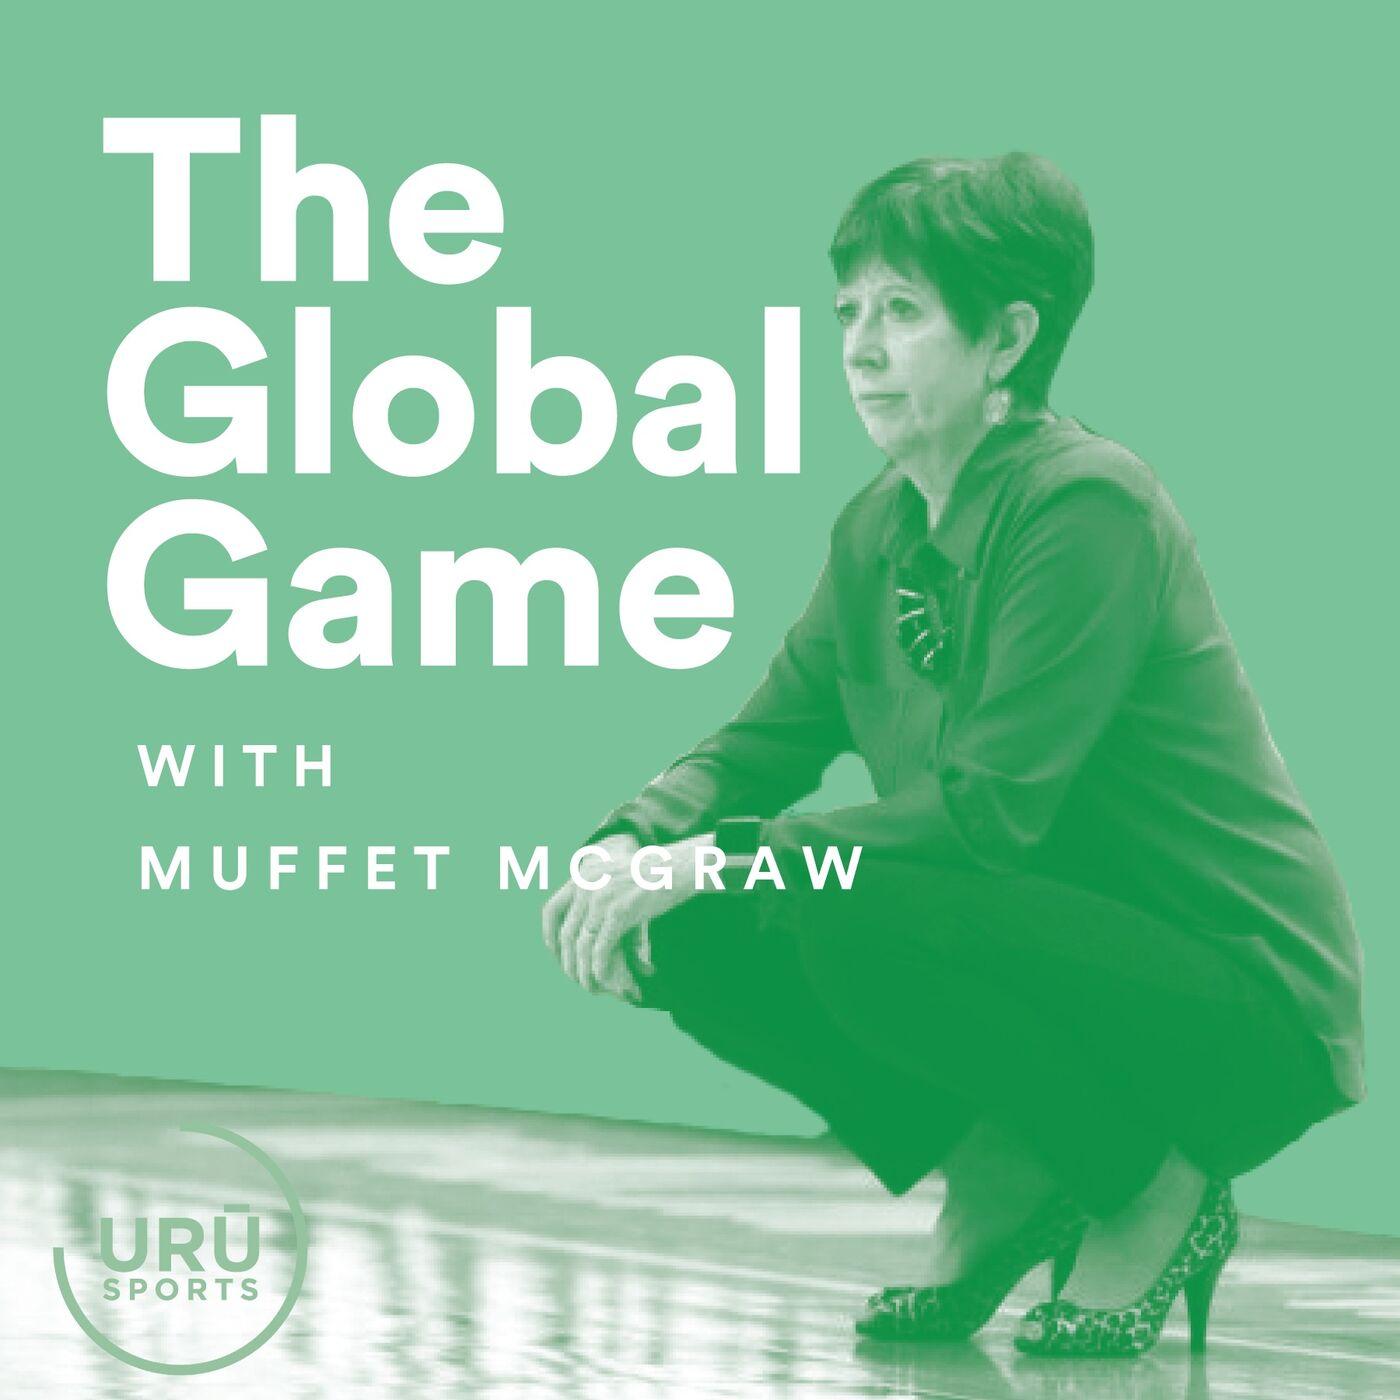 Muffet McGraw | We Got You, Coach